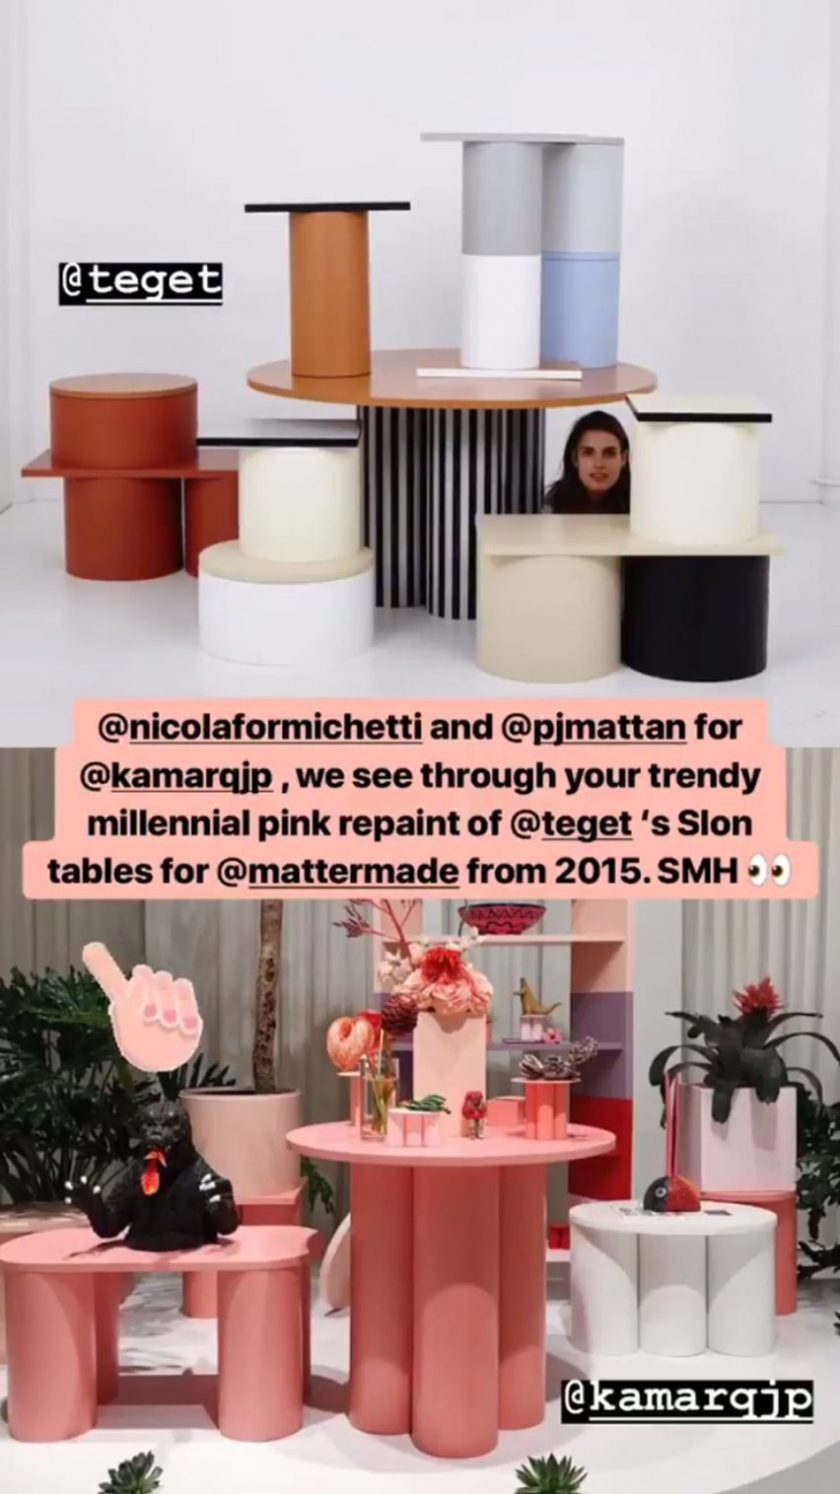 Diet Prada's plagiarism accusation, published on Instagram